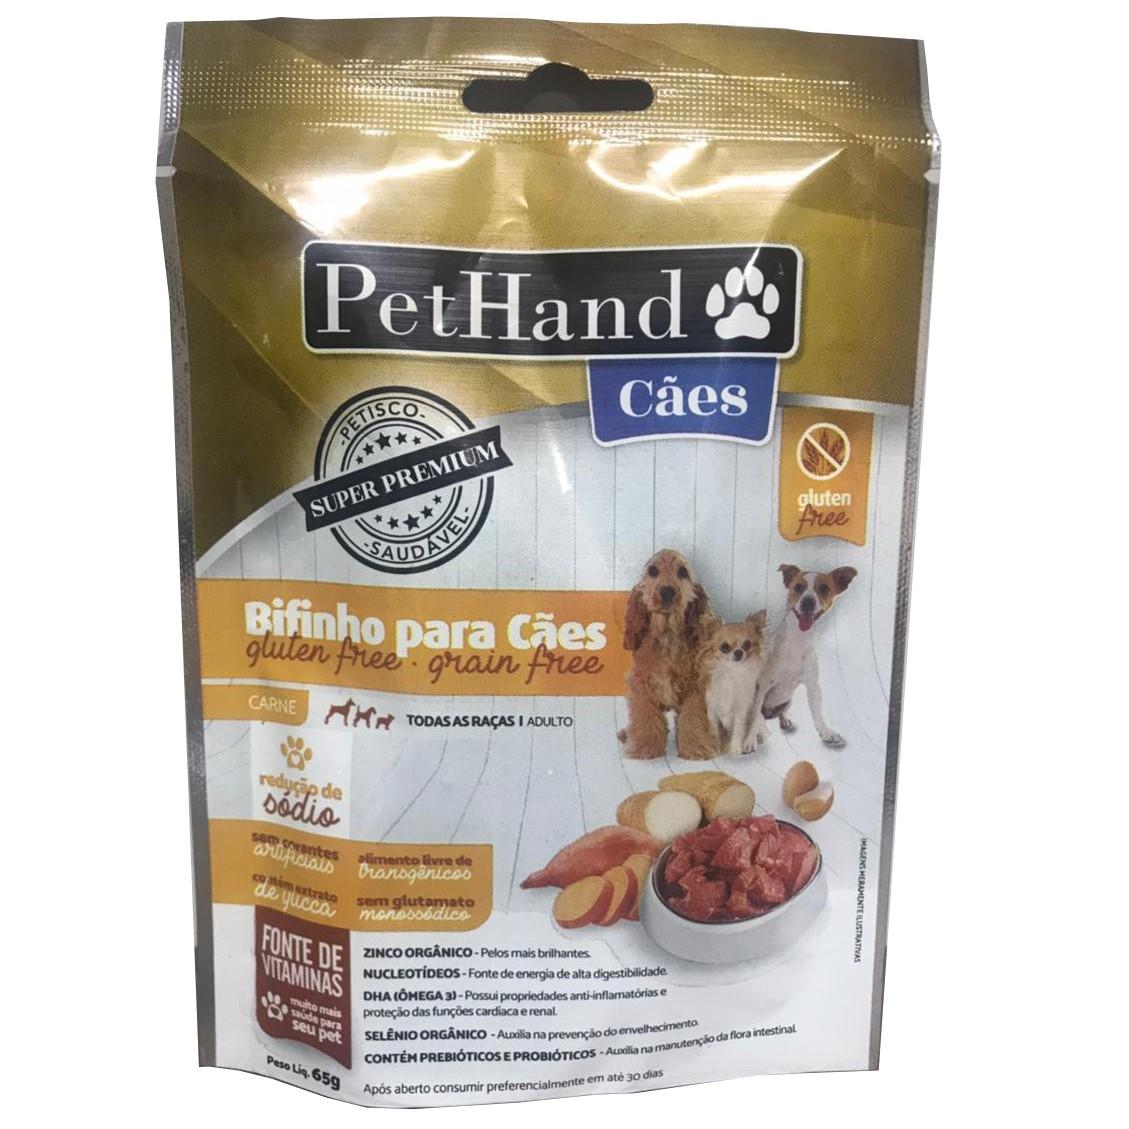 PetHand Cães Bifinho Super Premium Gluten Free Carne